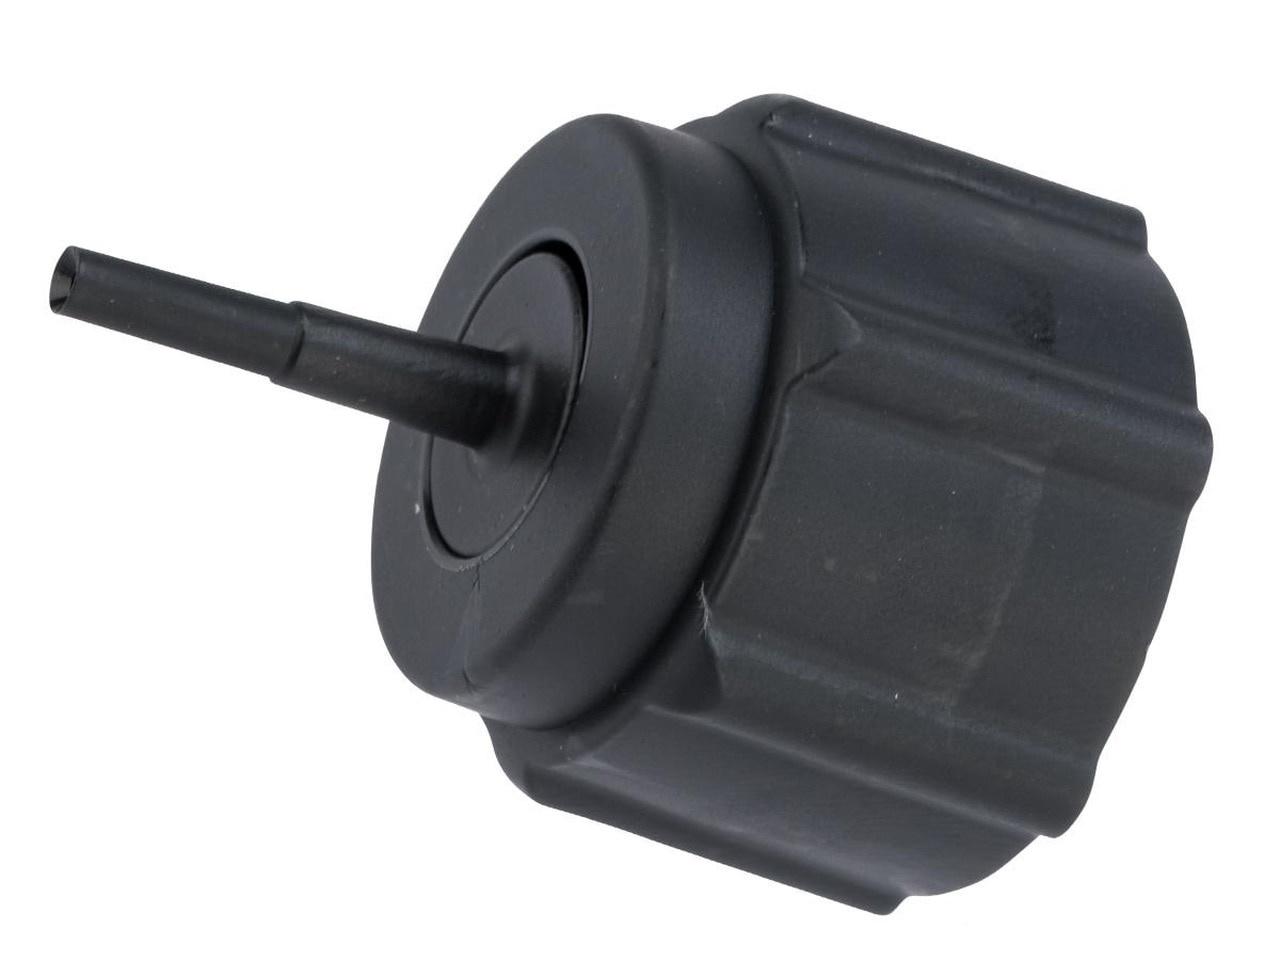 Palco Propane Green Gas Adapter